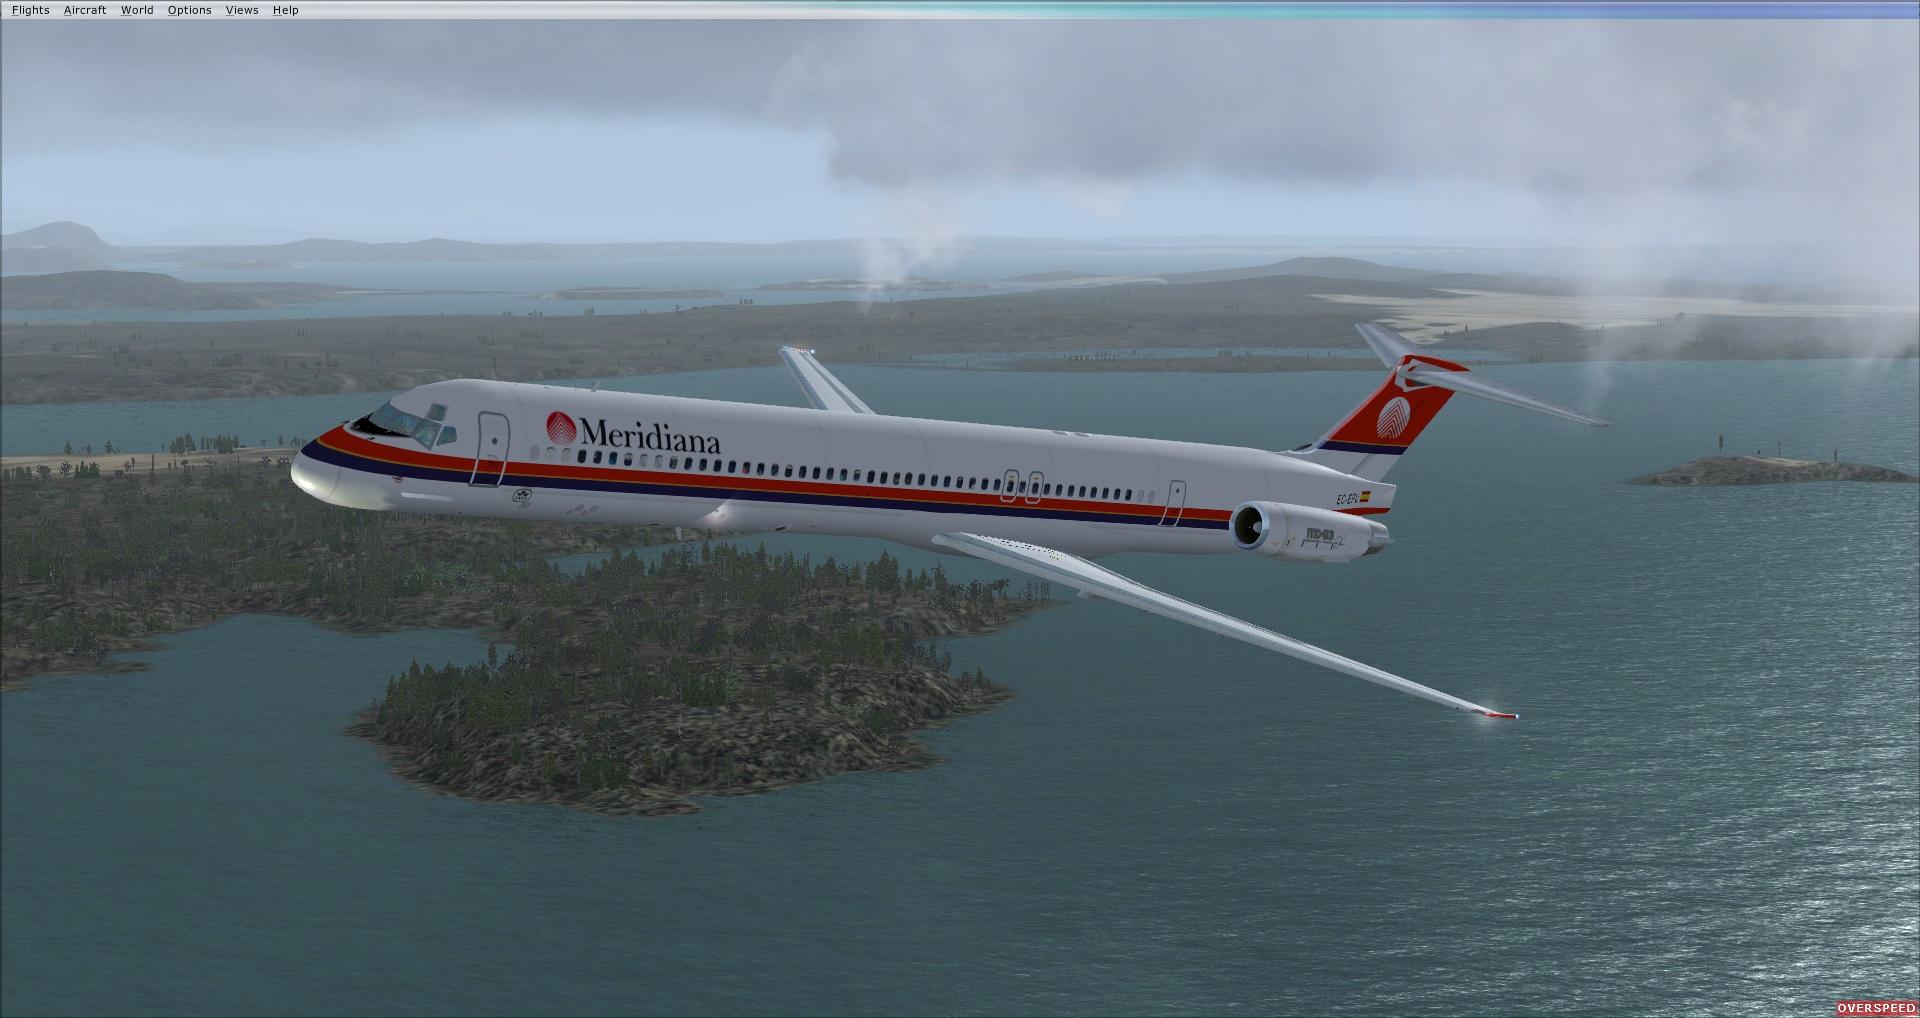 fs-freeware net - Civil Aircraft